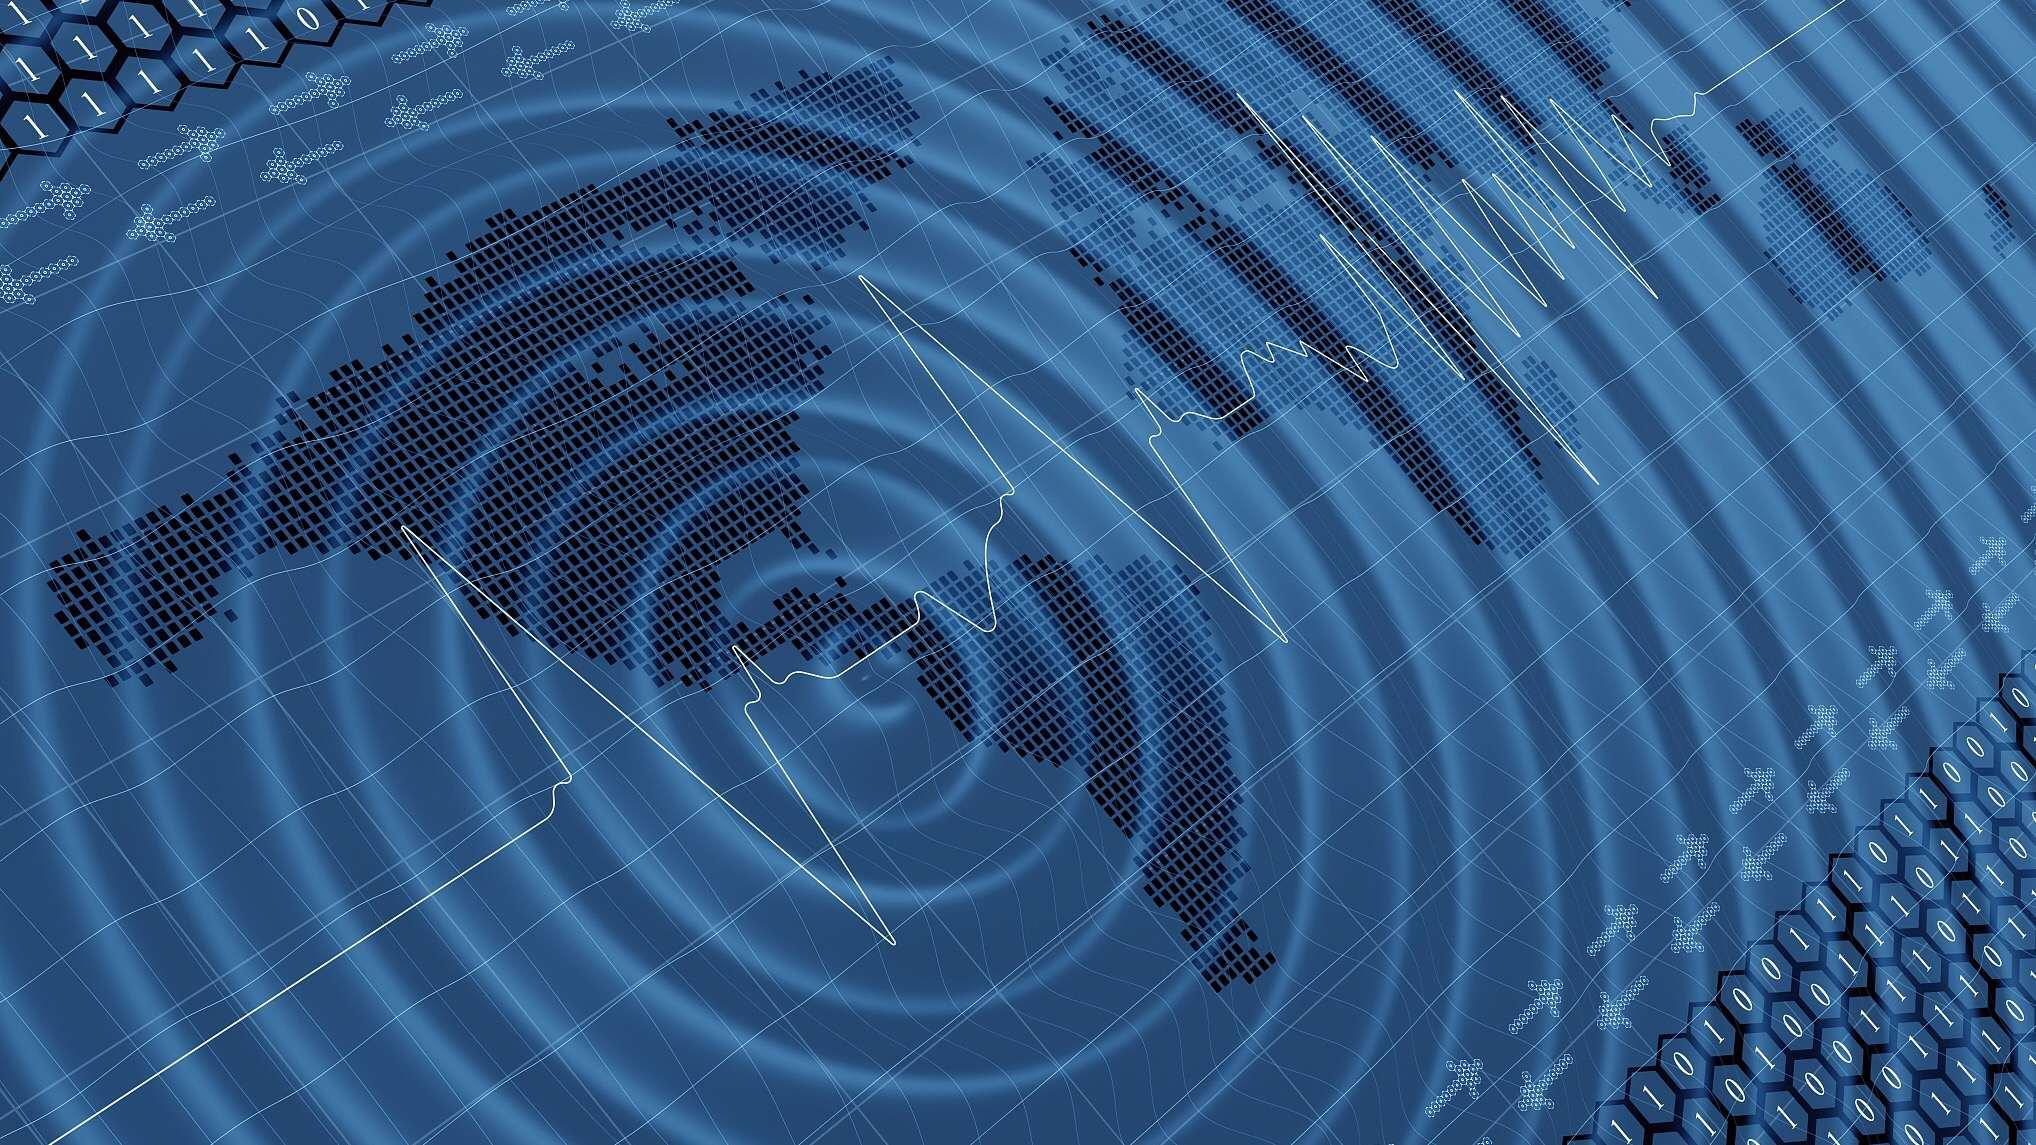 5.1-magnitude quake hits 69 km NE of Norsup, Vanuatu: USGS